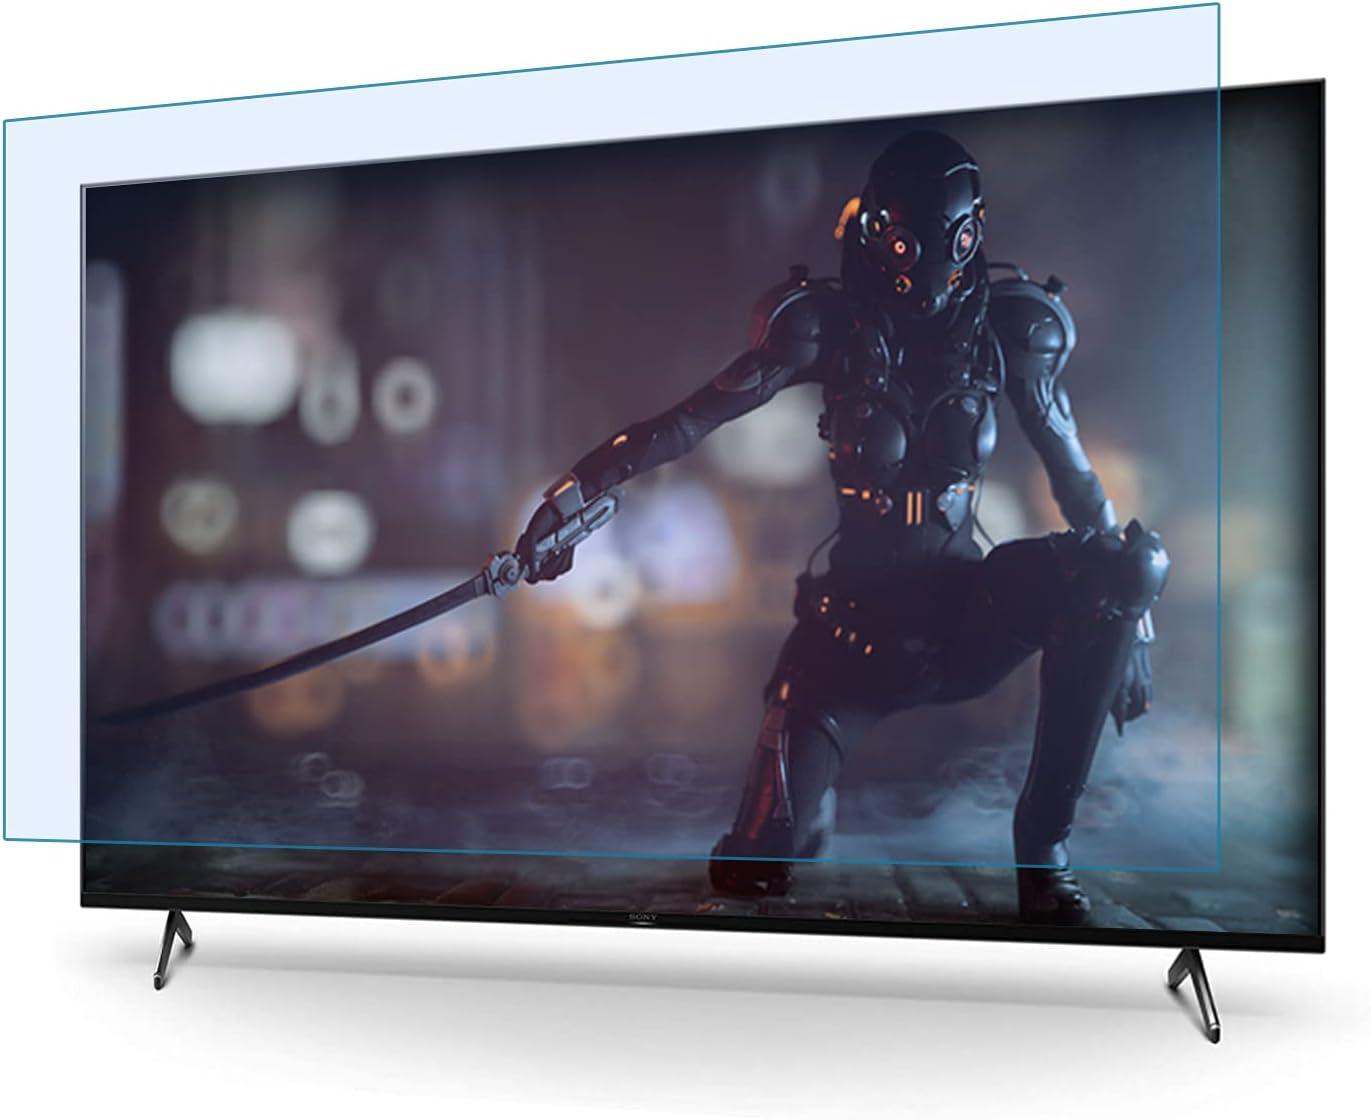 Anti-Glare TV Screen Protector Filter Scratc Anti Out Light Blue Alternative dealer 25% OFF